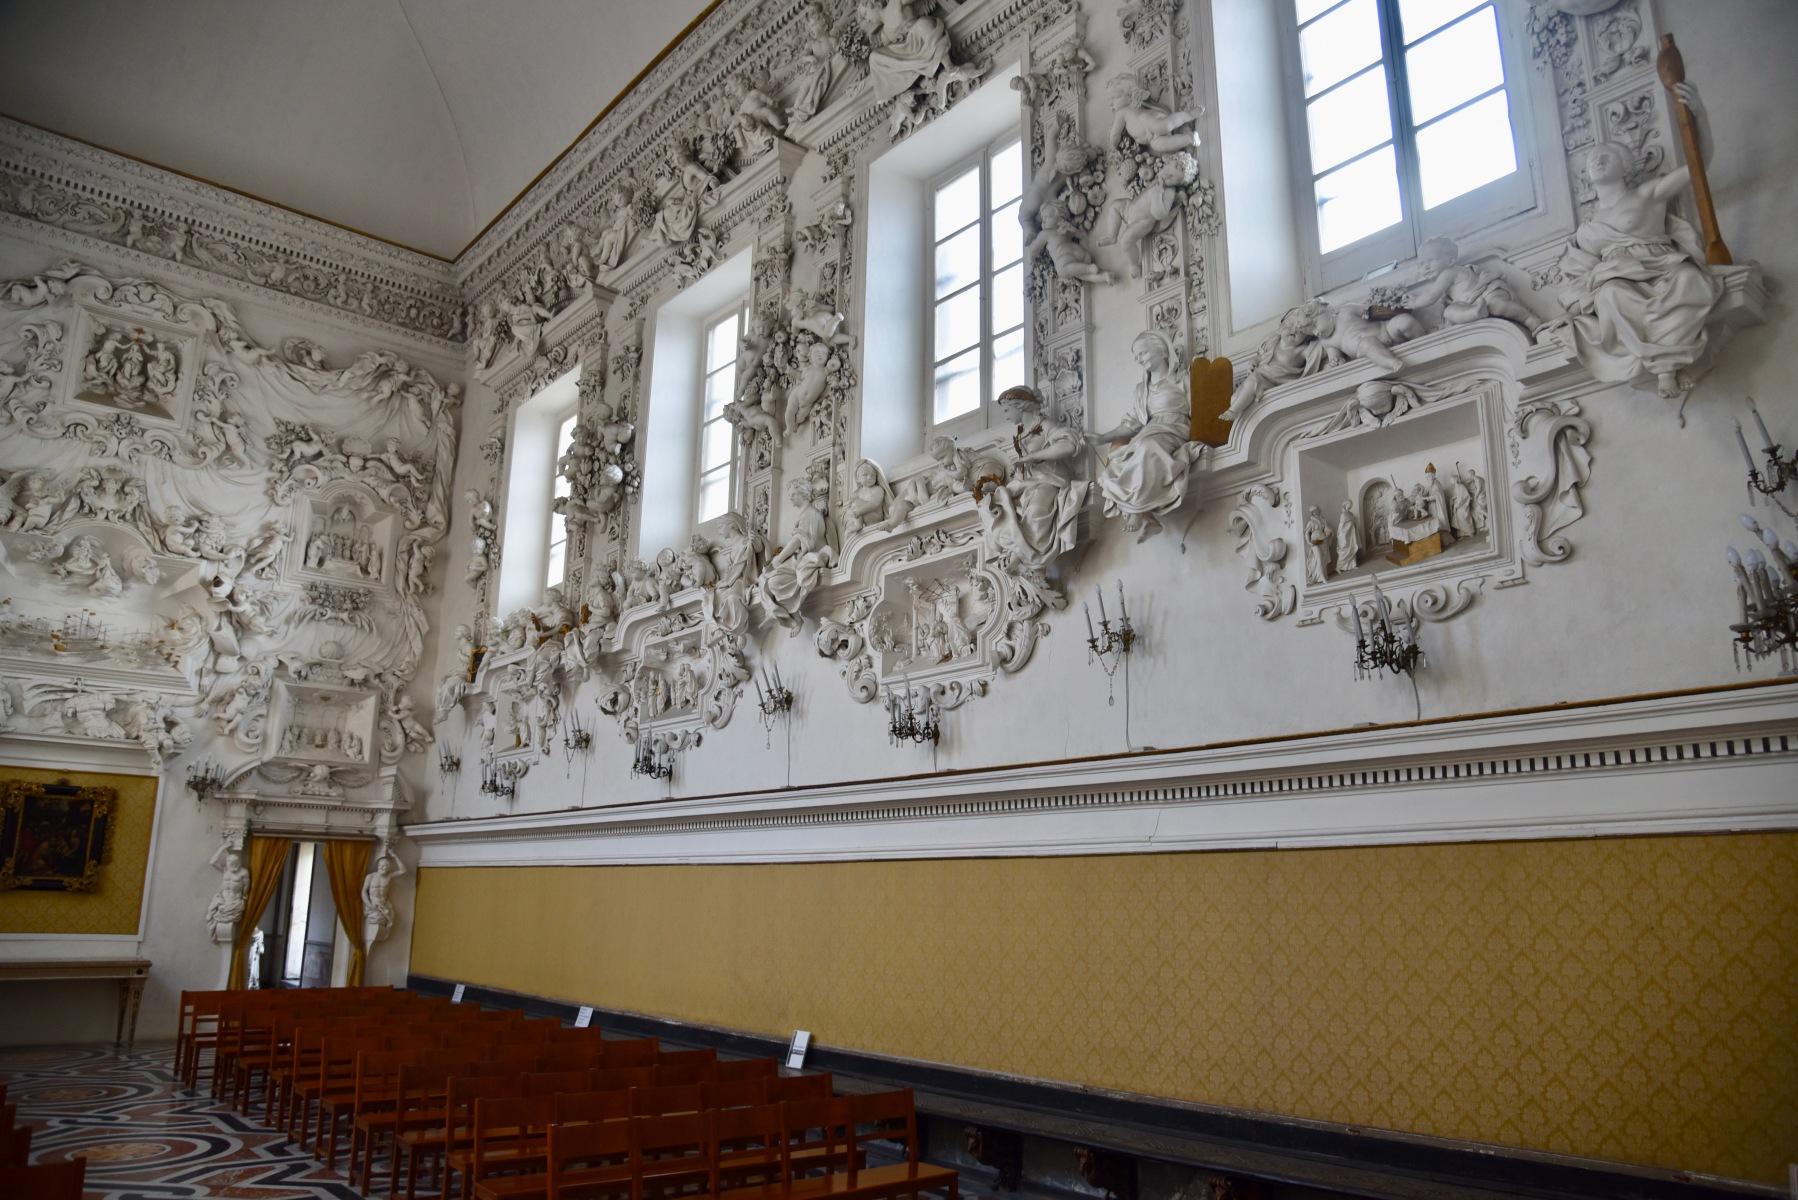 Oratorio-Santa-Cita-parete-con-teatrini-2